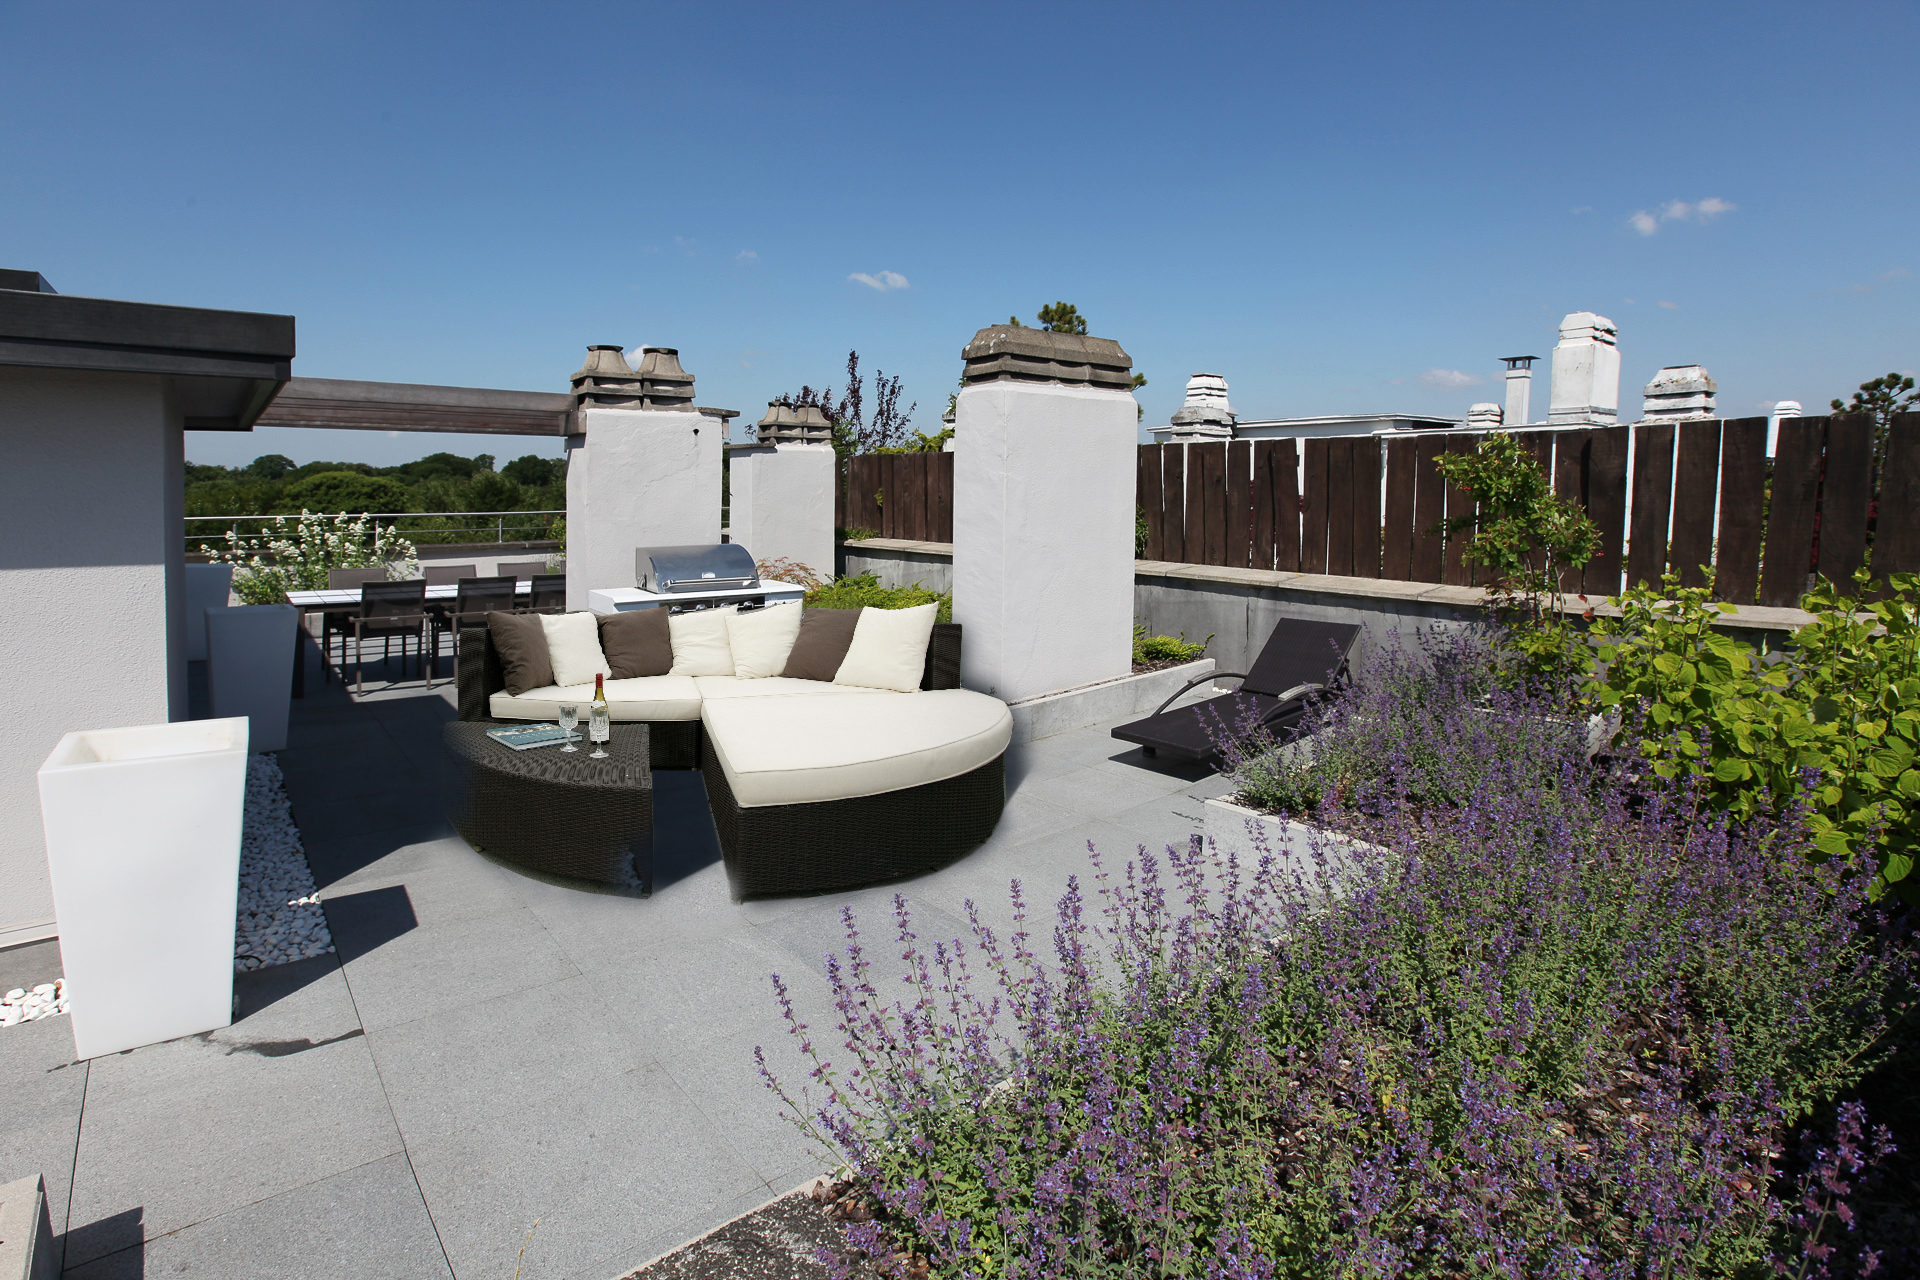 penthouse en style campagnard marcotte style. Black Bedroom Furniture Sets. Home Design Ideas